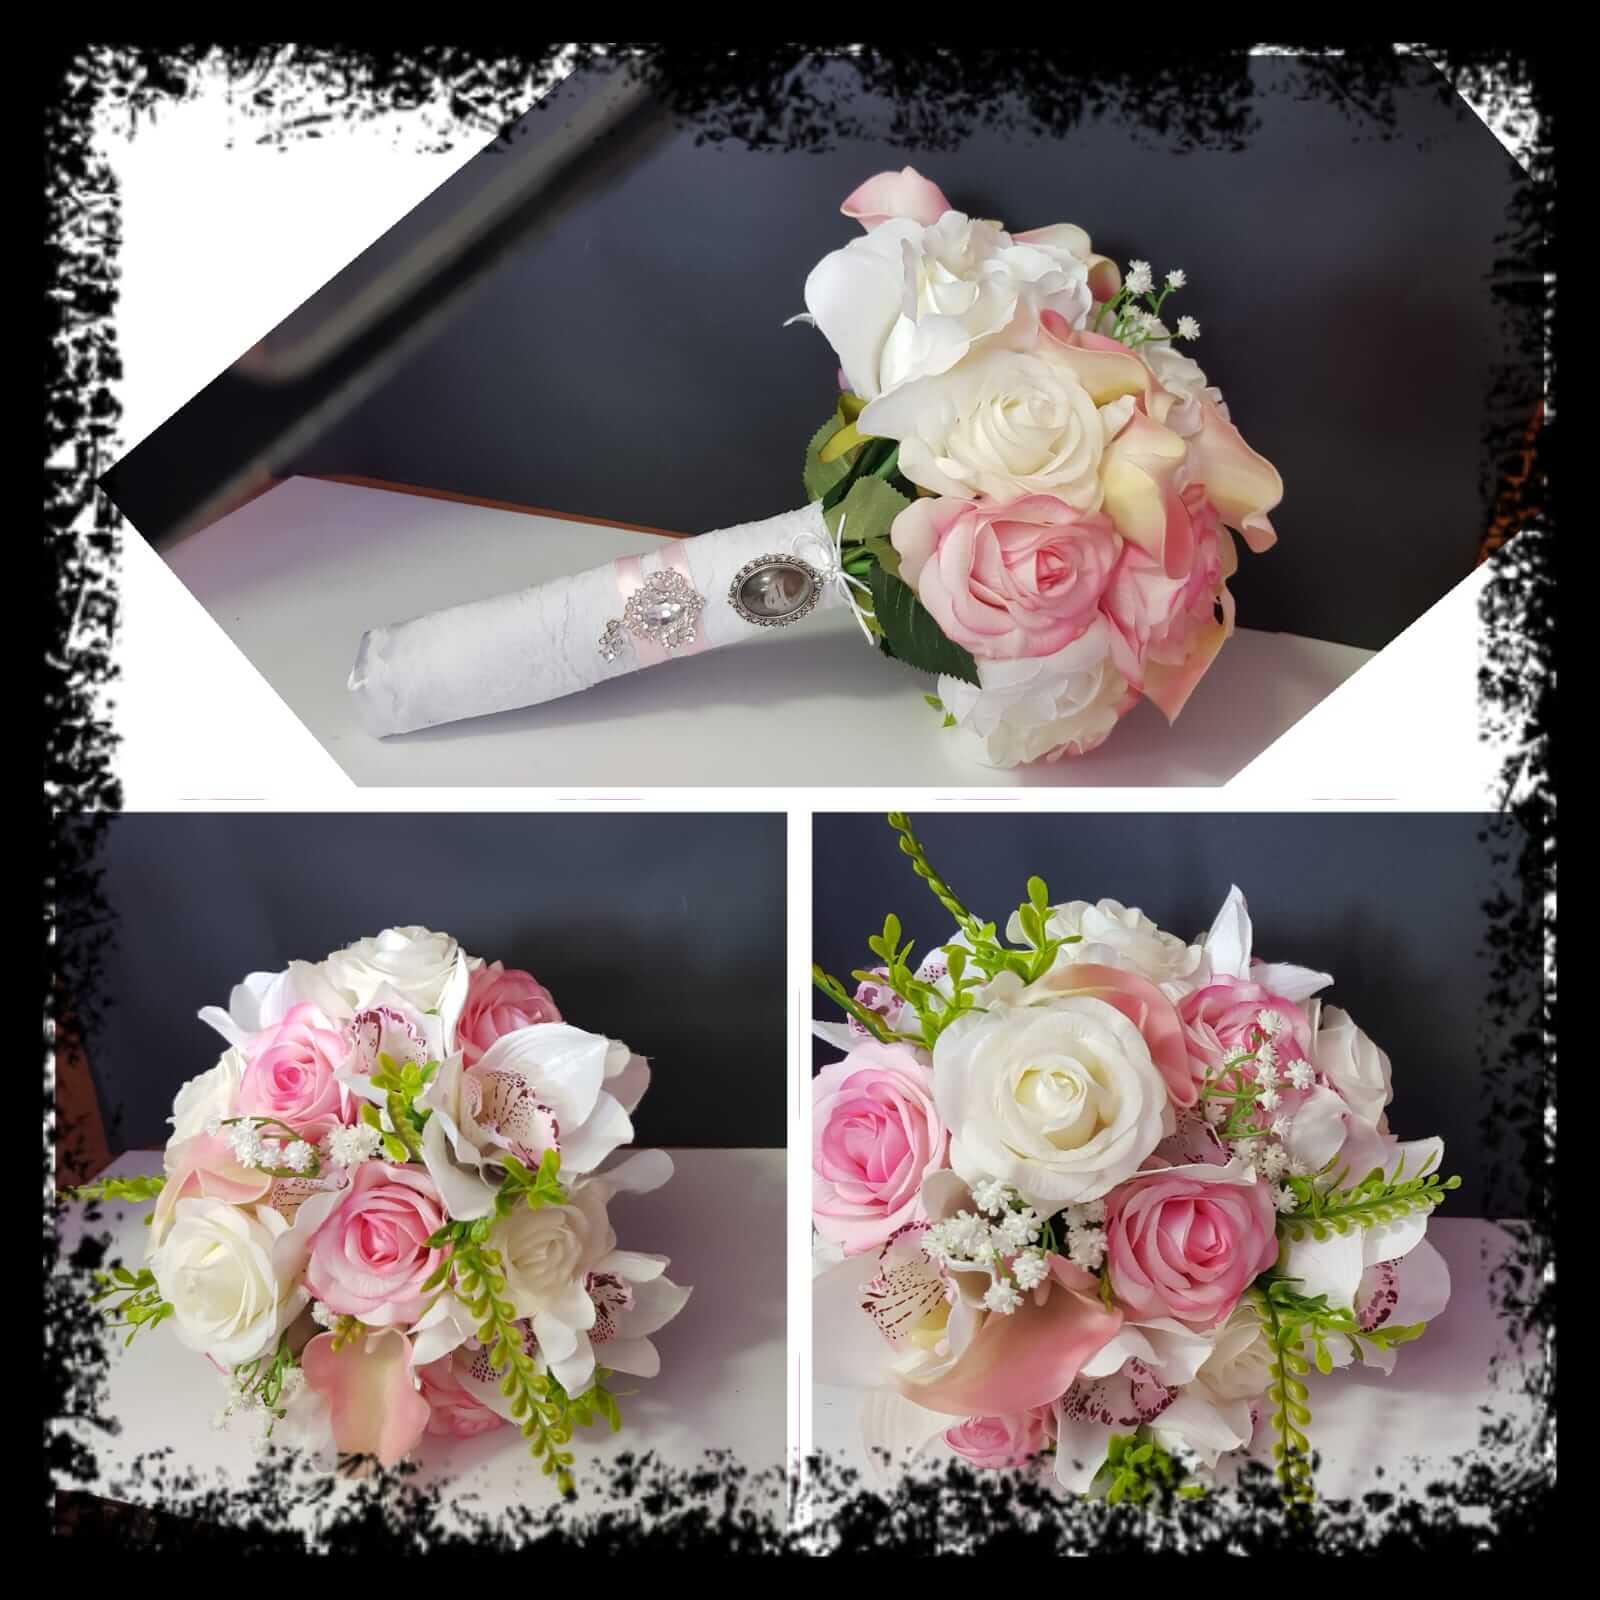 ramo de novia ramo de novia - ramos novia 11 - Ramo de novia